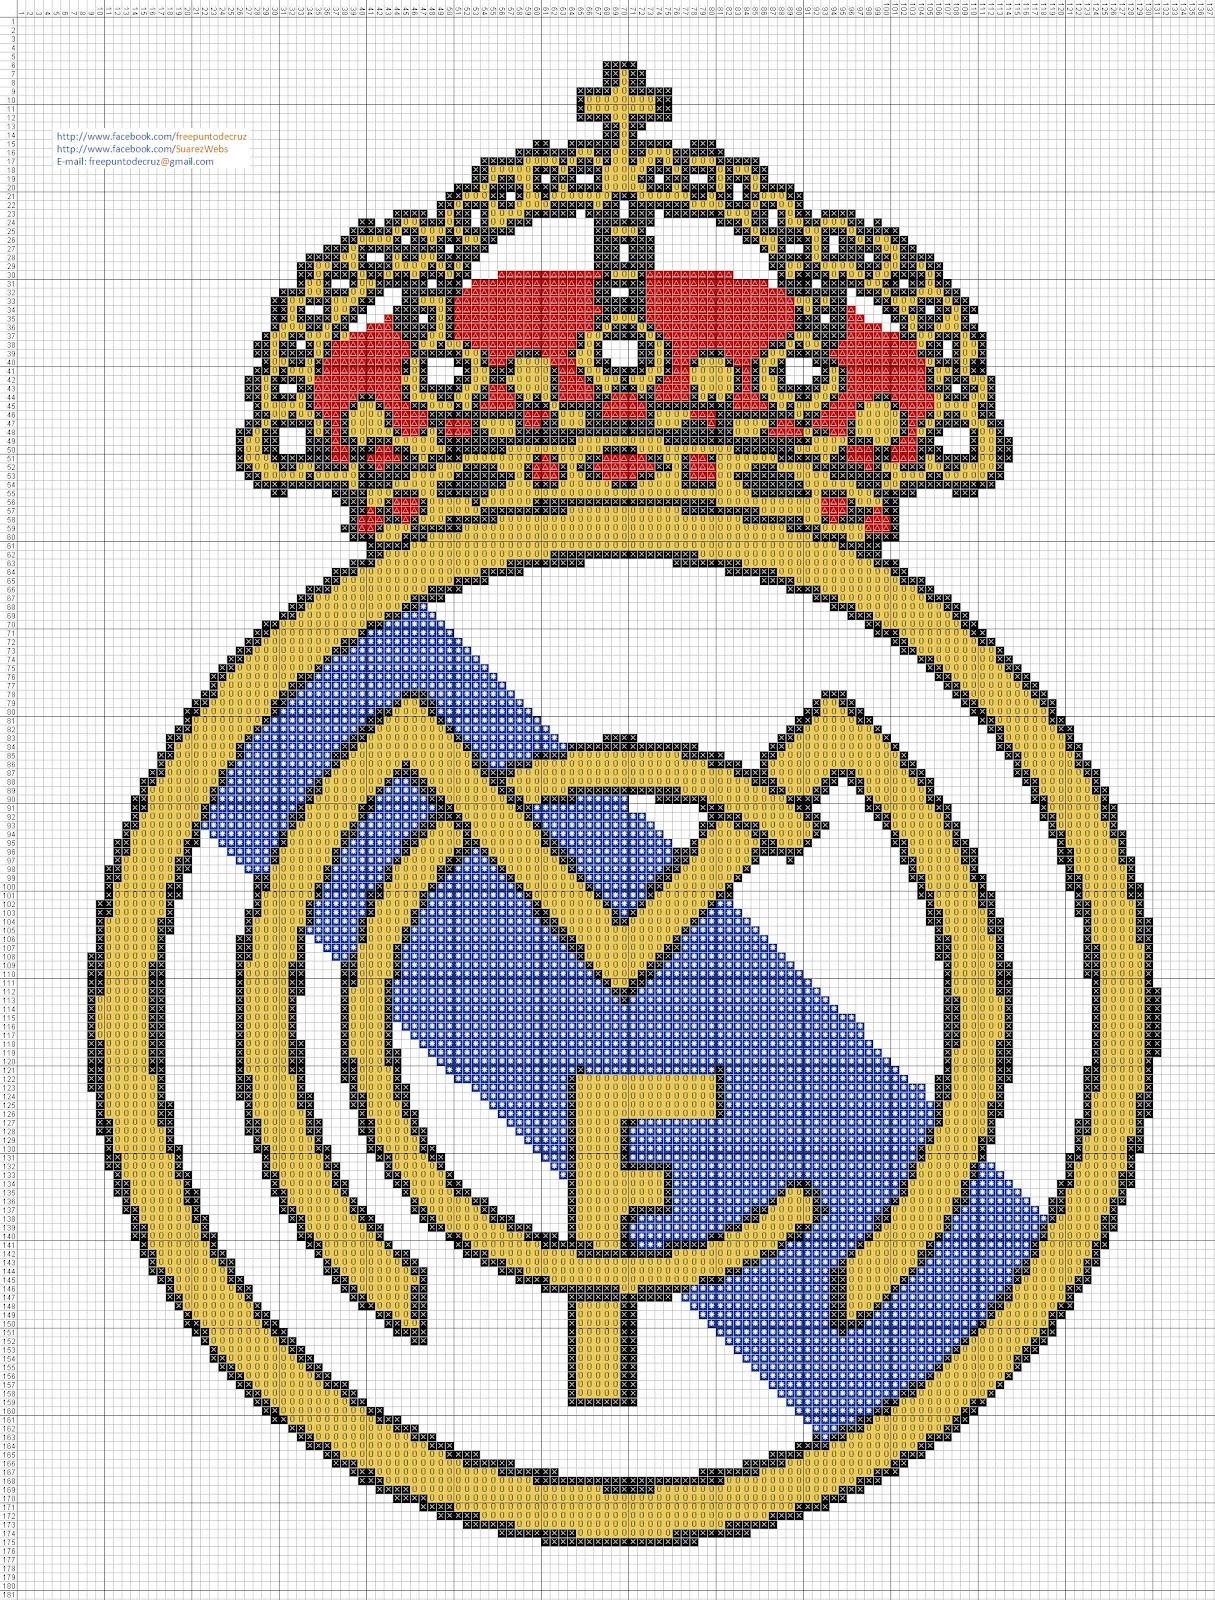 1000 images about logo on pinterest sport football - Muestras y motivos punto de cruz ...